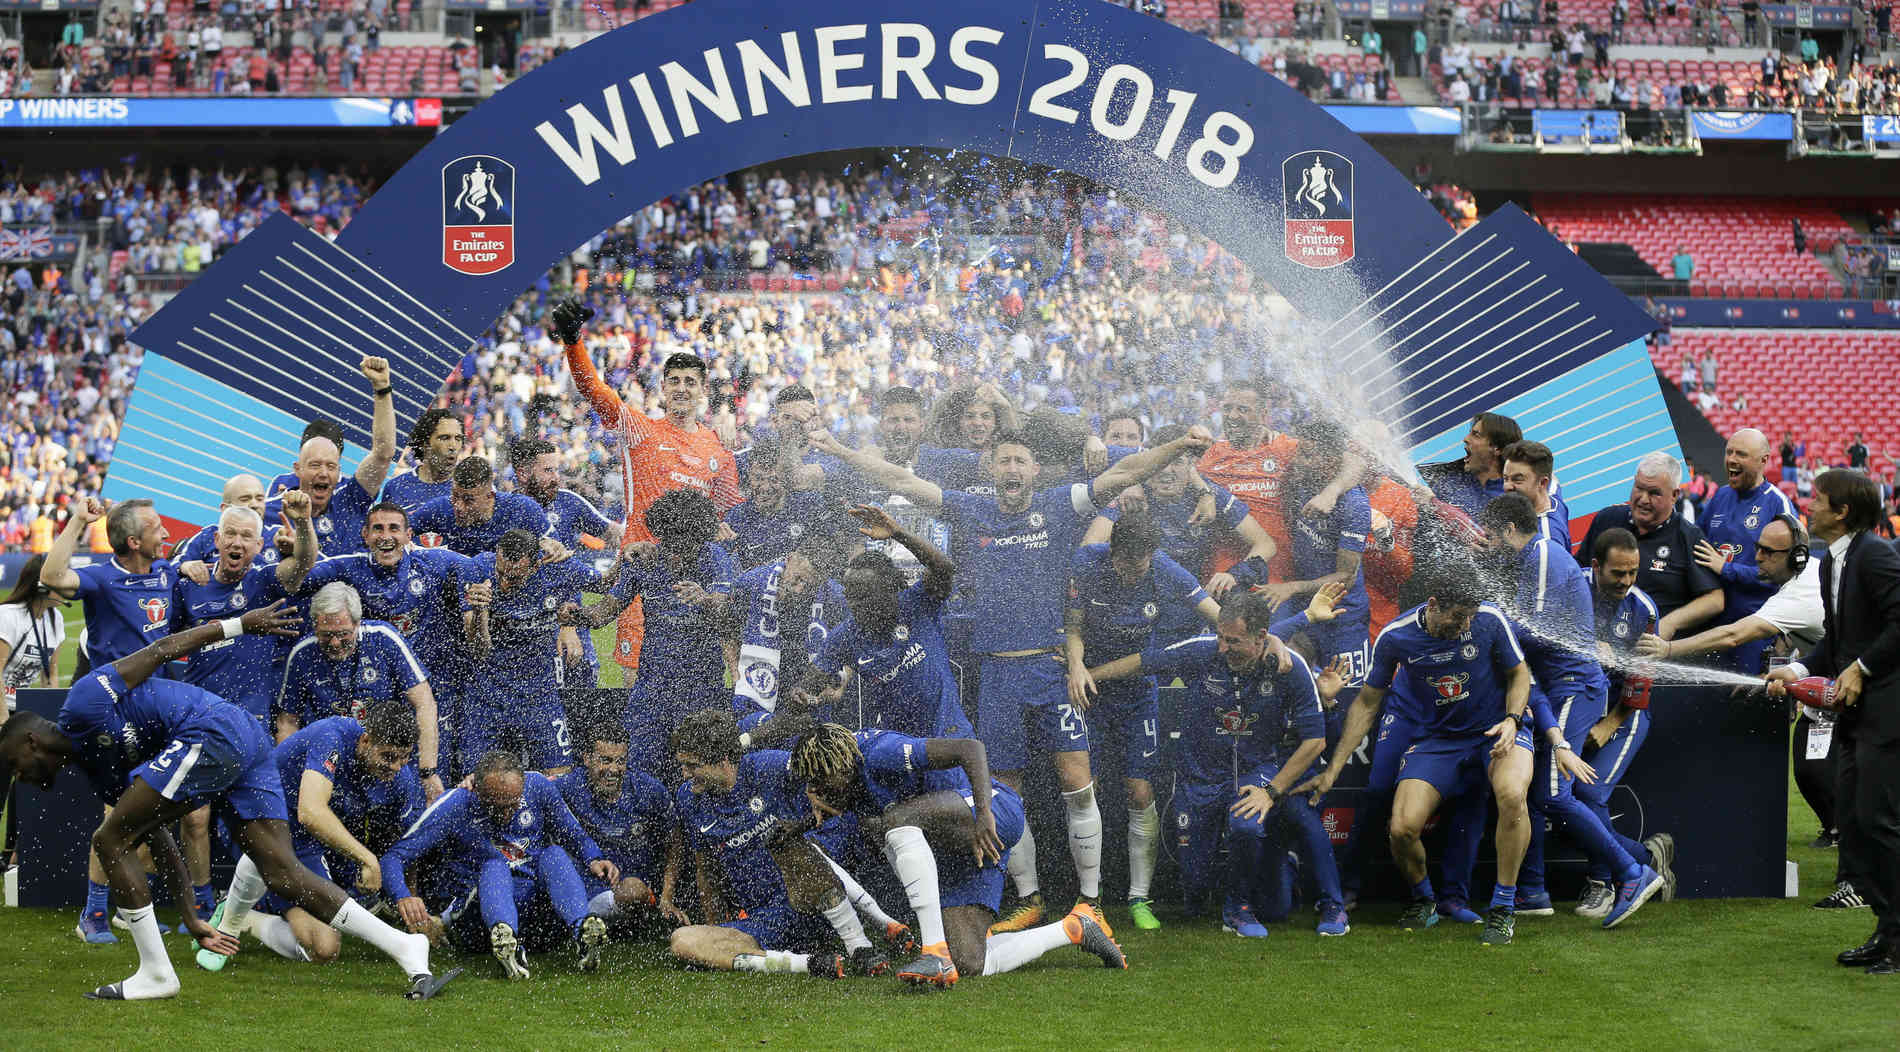 FA-Cup-Sieger bekommt nur noch alkoholfreiem Champagner